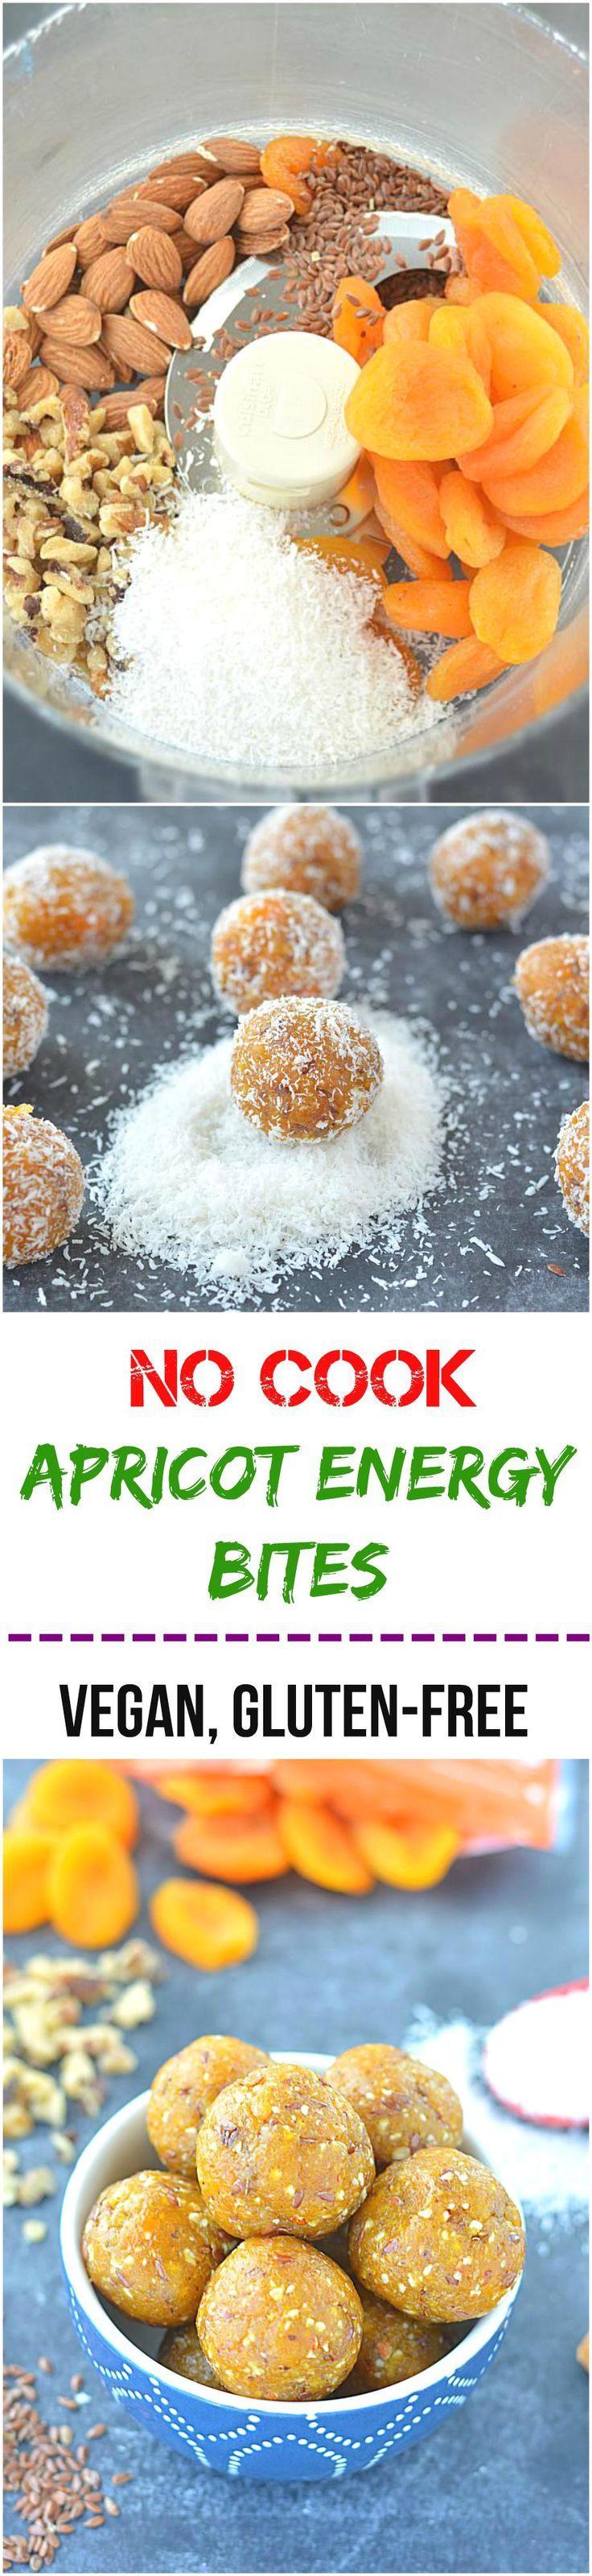 No Cook Apricot Energy Bites